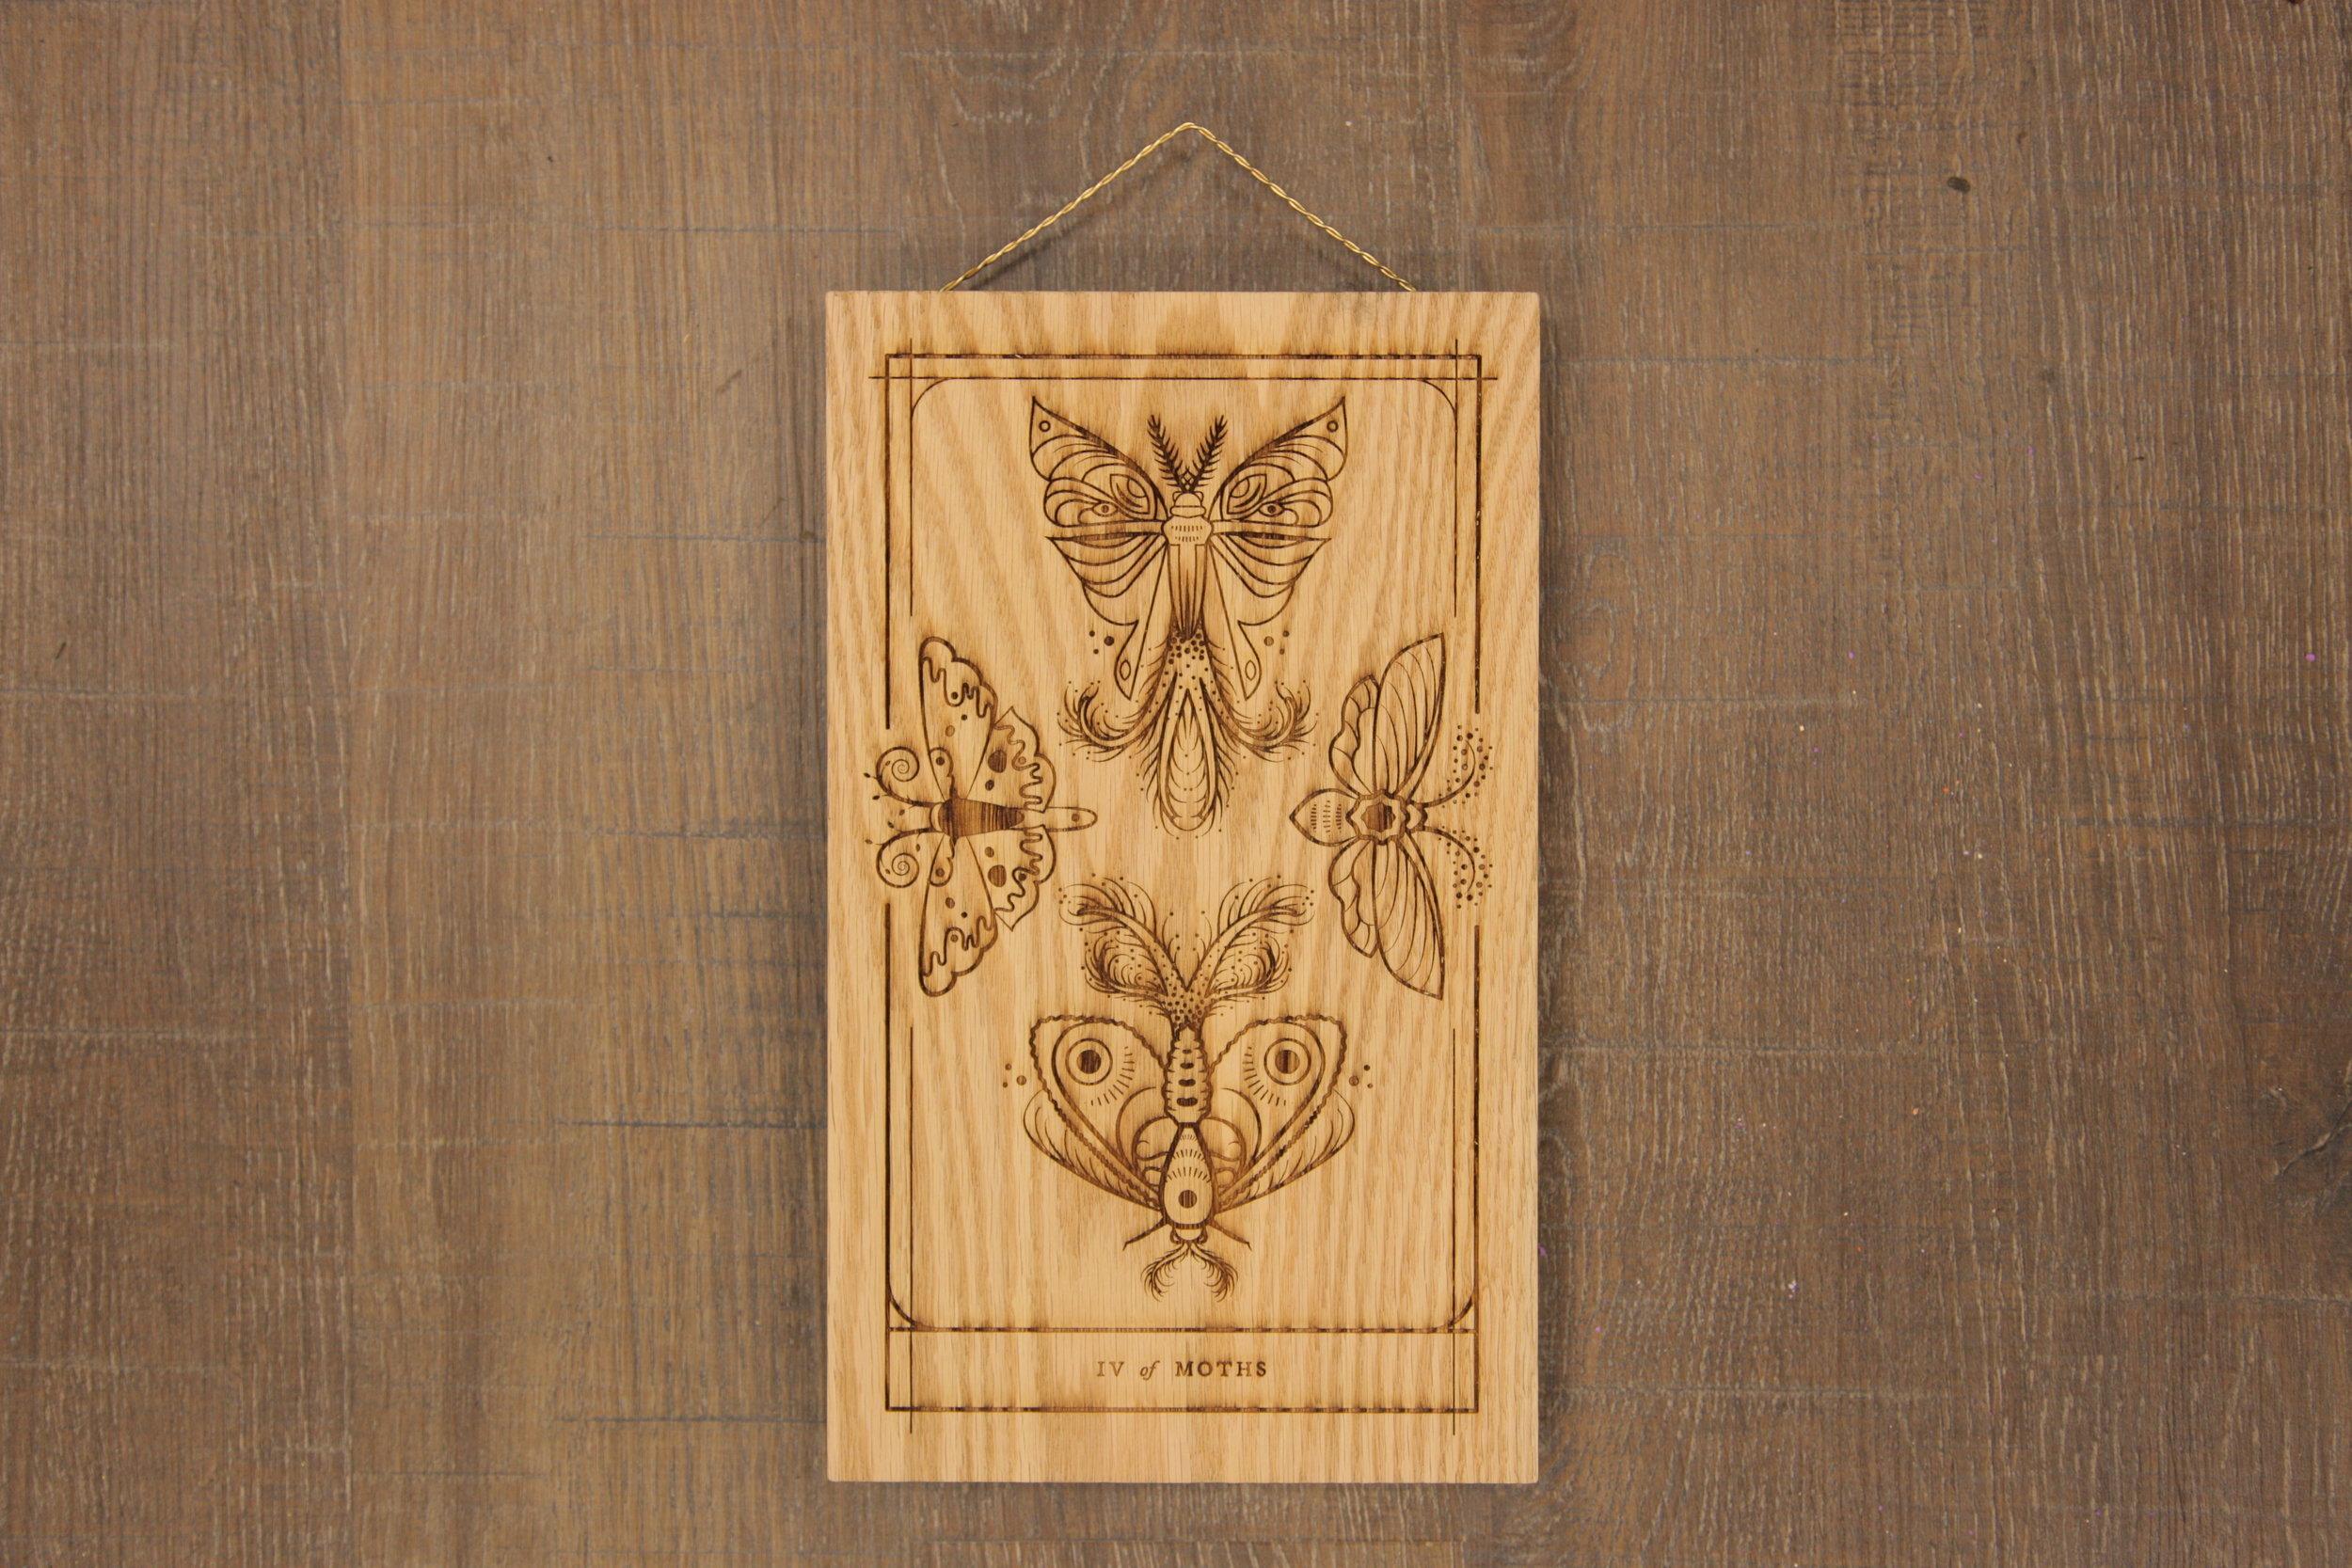 Four of Moths